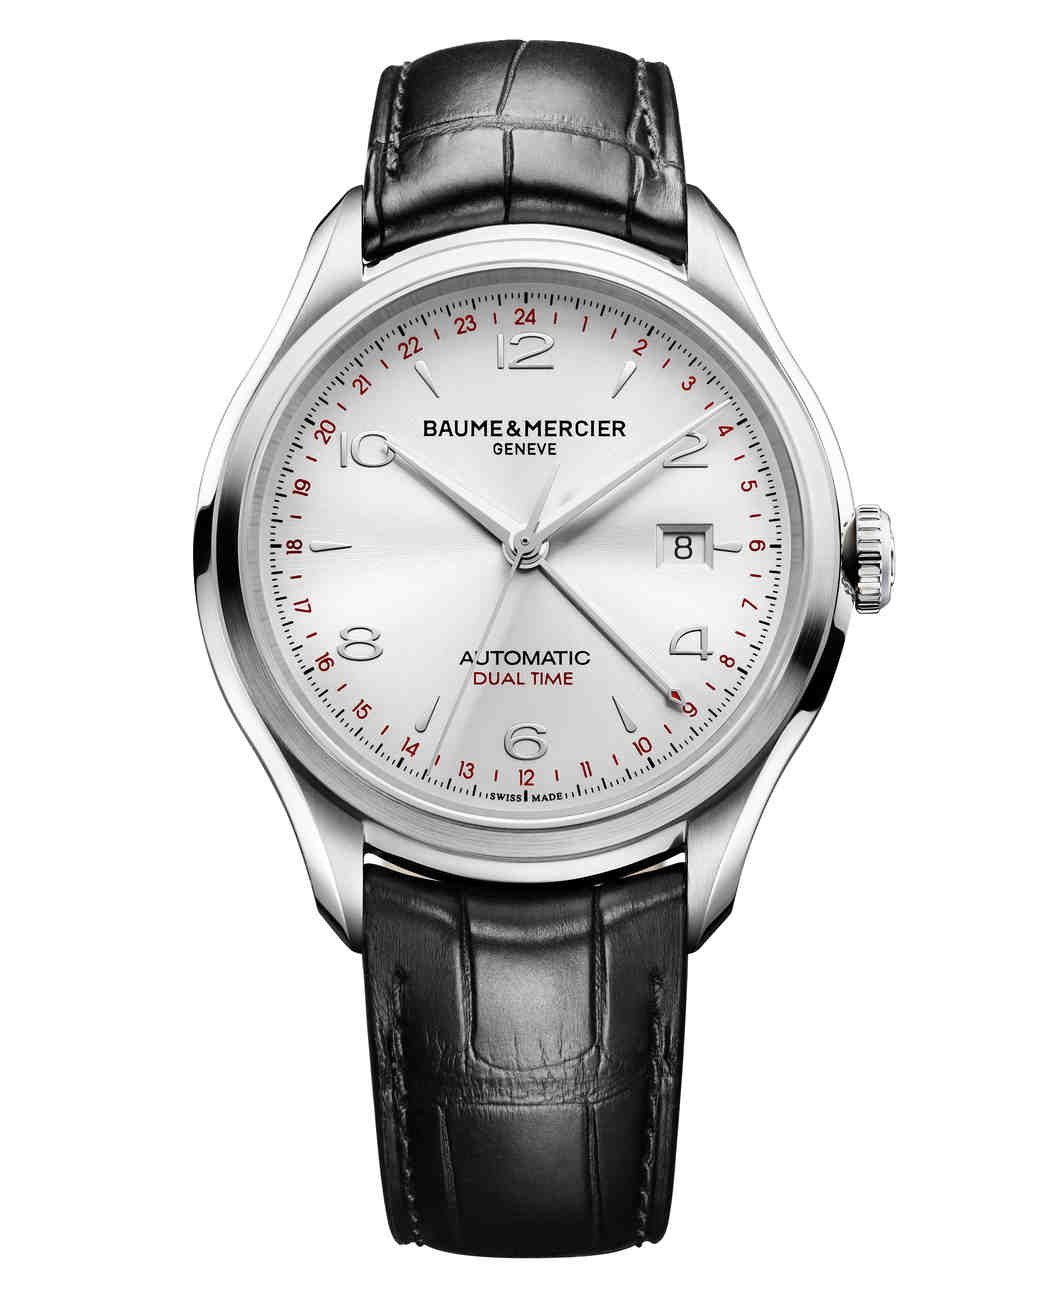 baume-mercier-watch-clifton-10112-soldat-0514.jpg